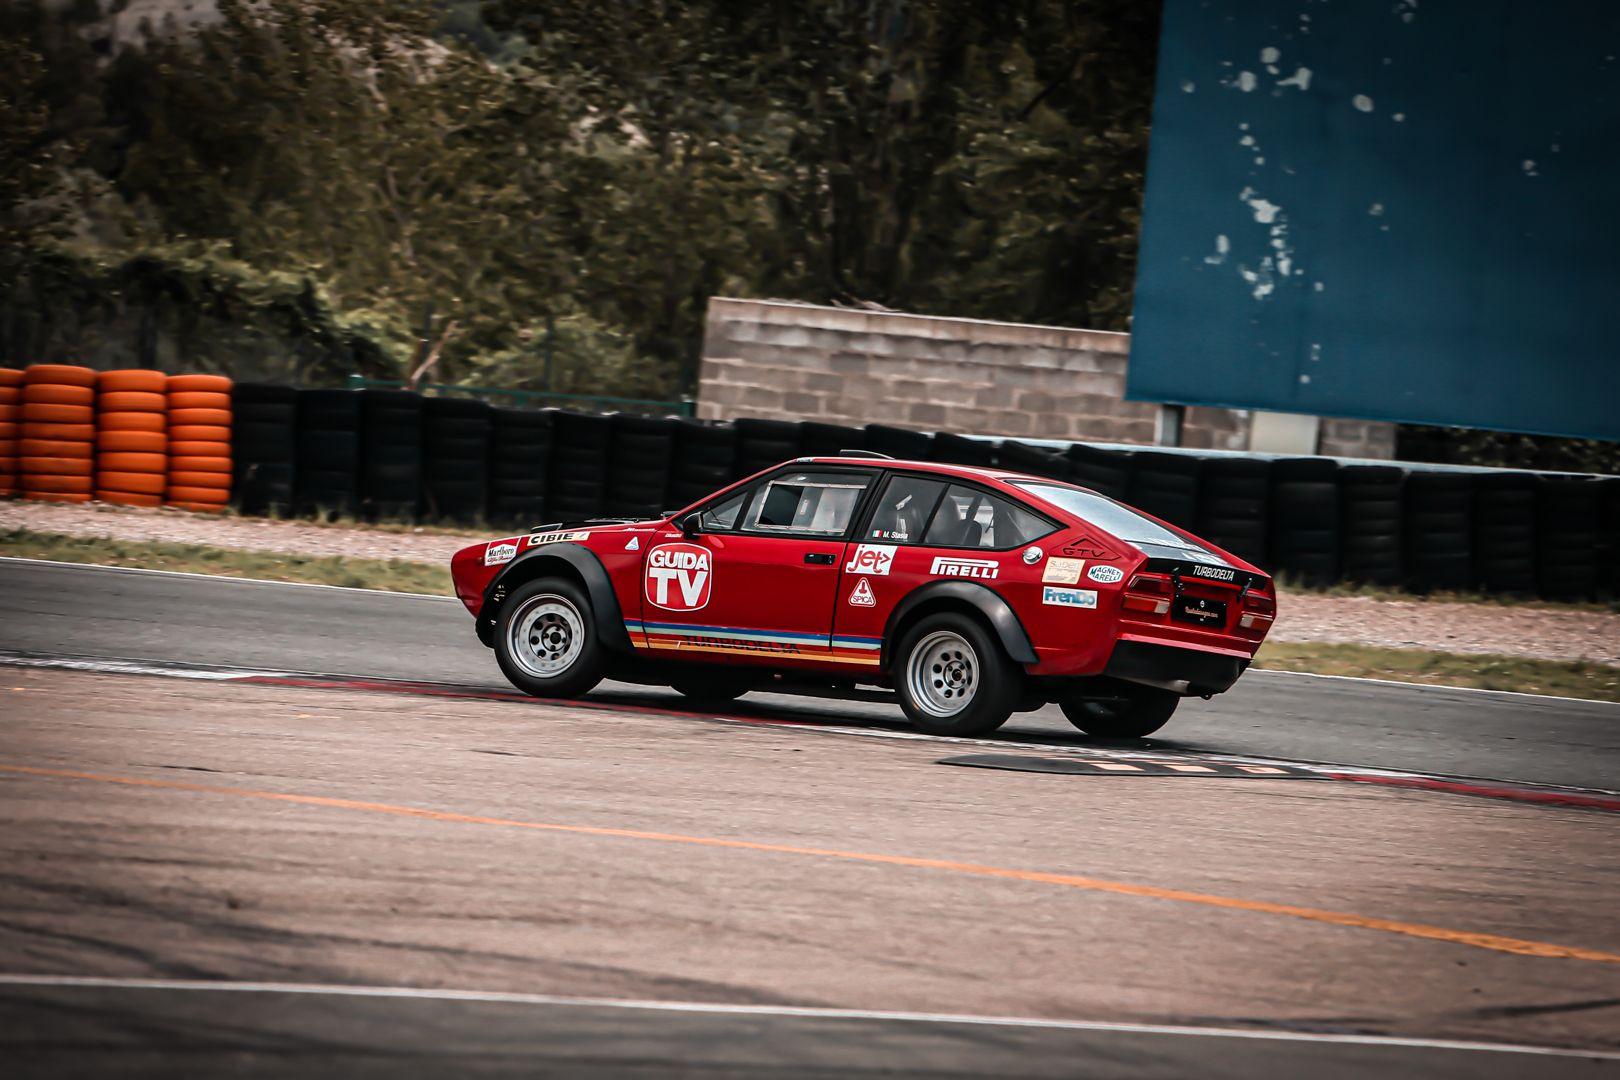 1979 Alfa Romeo Alfetta GTV Turbodelta Gr.4 71137